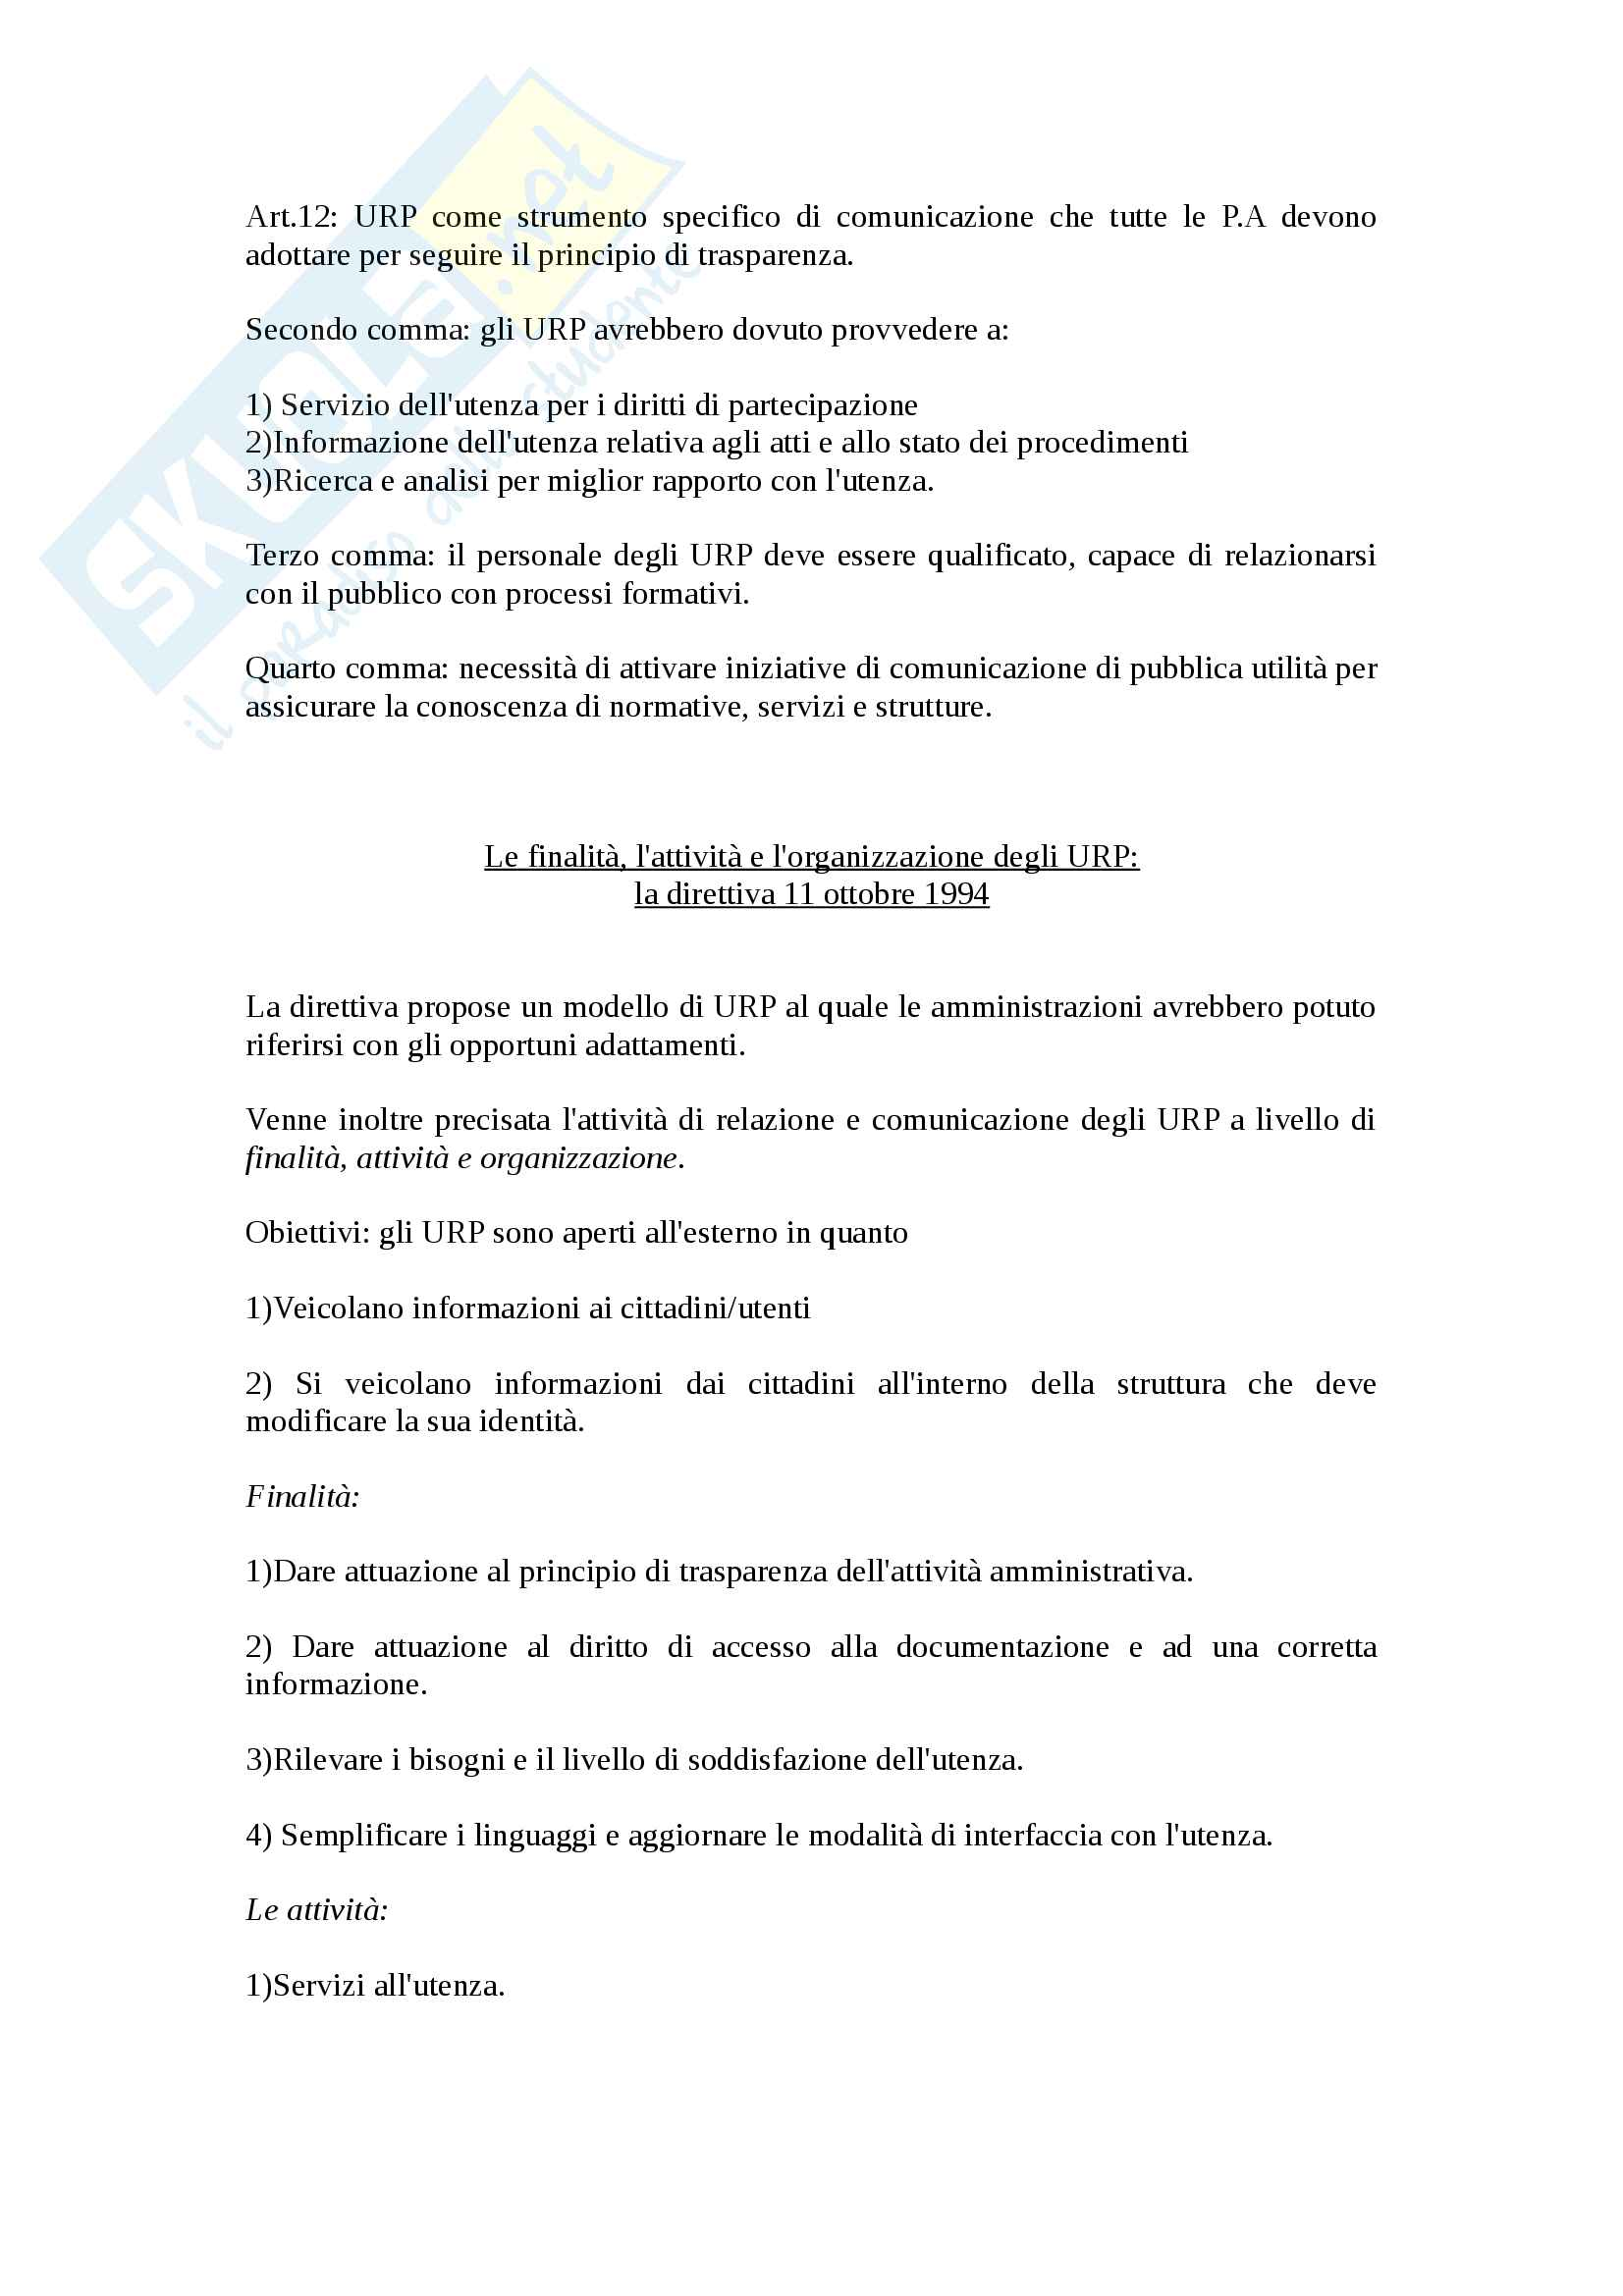 Riassunto esame comunicazione pubblica, prof. Grandi, La comunicazione pubblica, Roberto Grandi Pag. 26